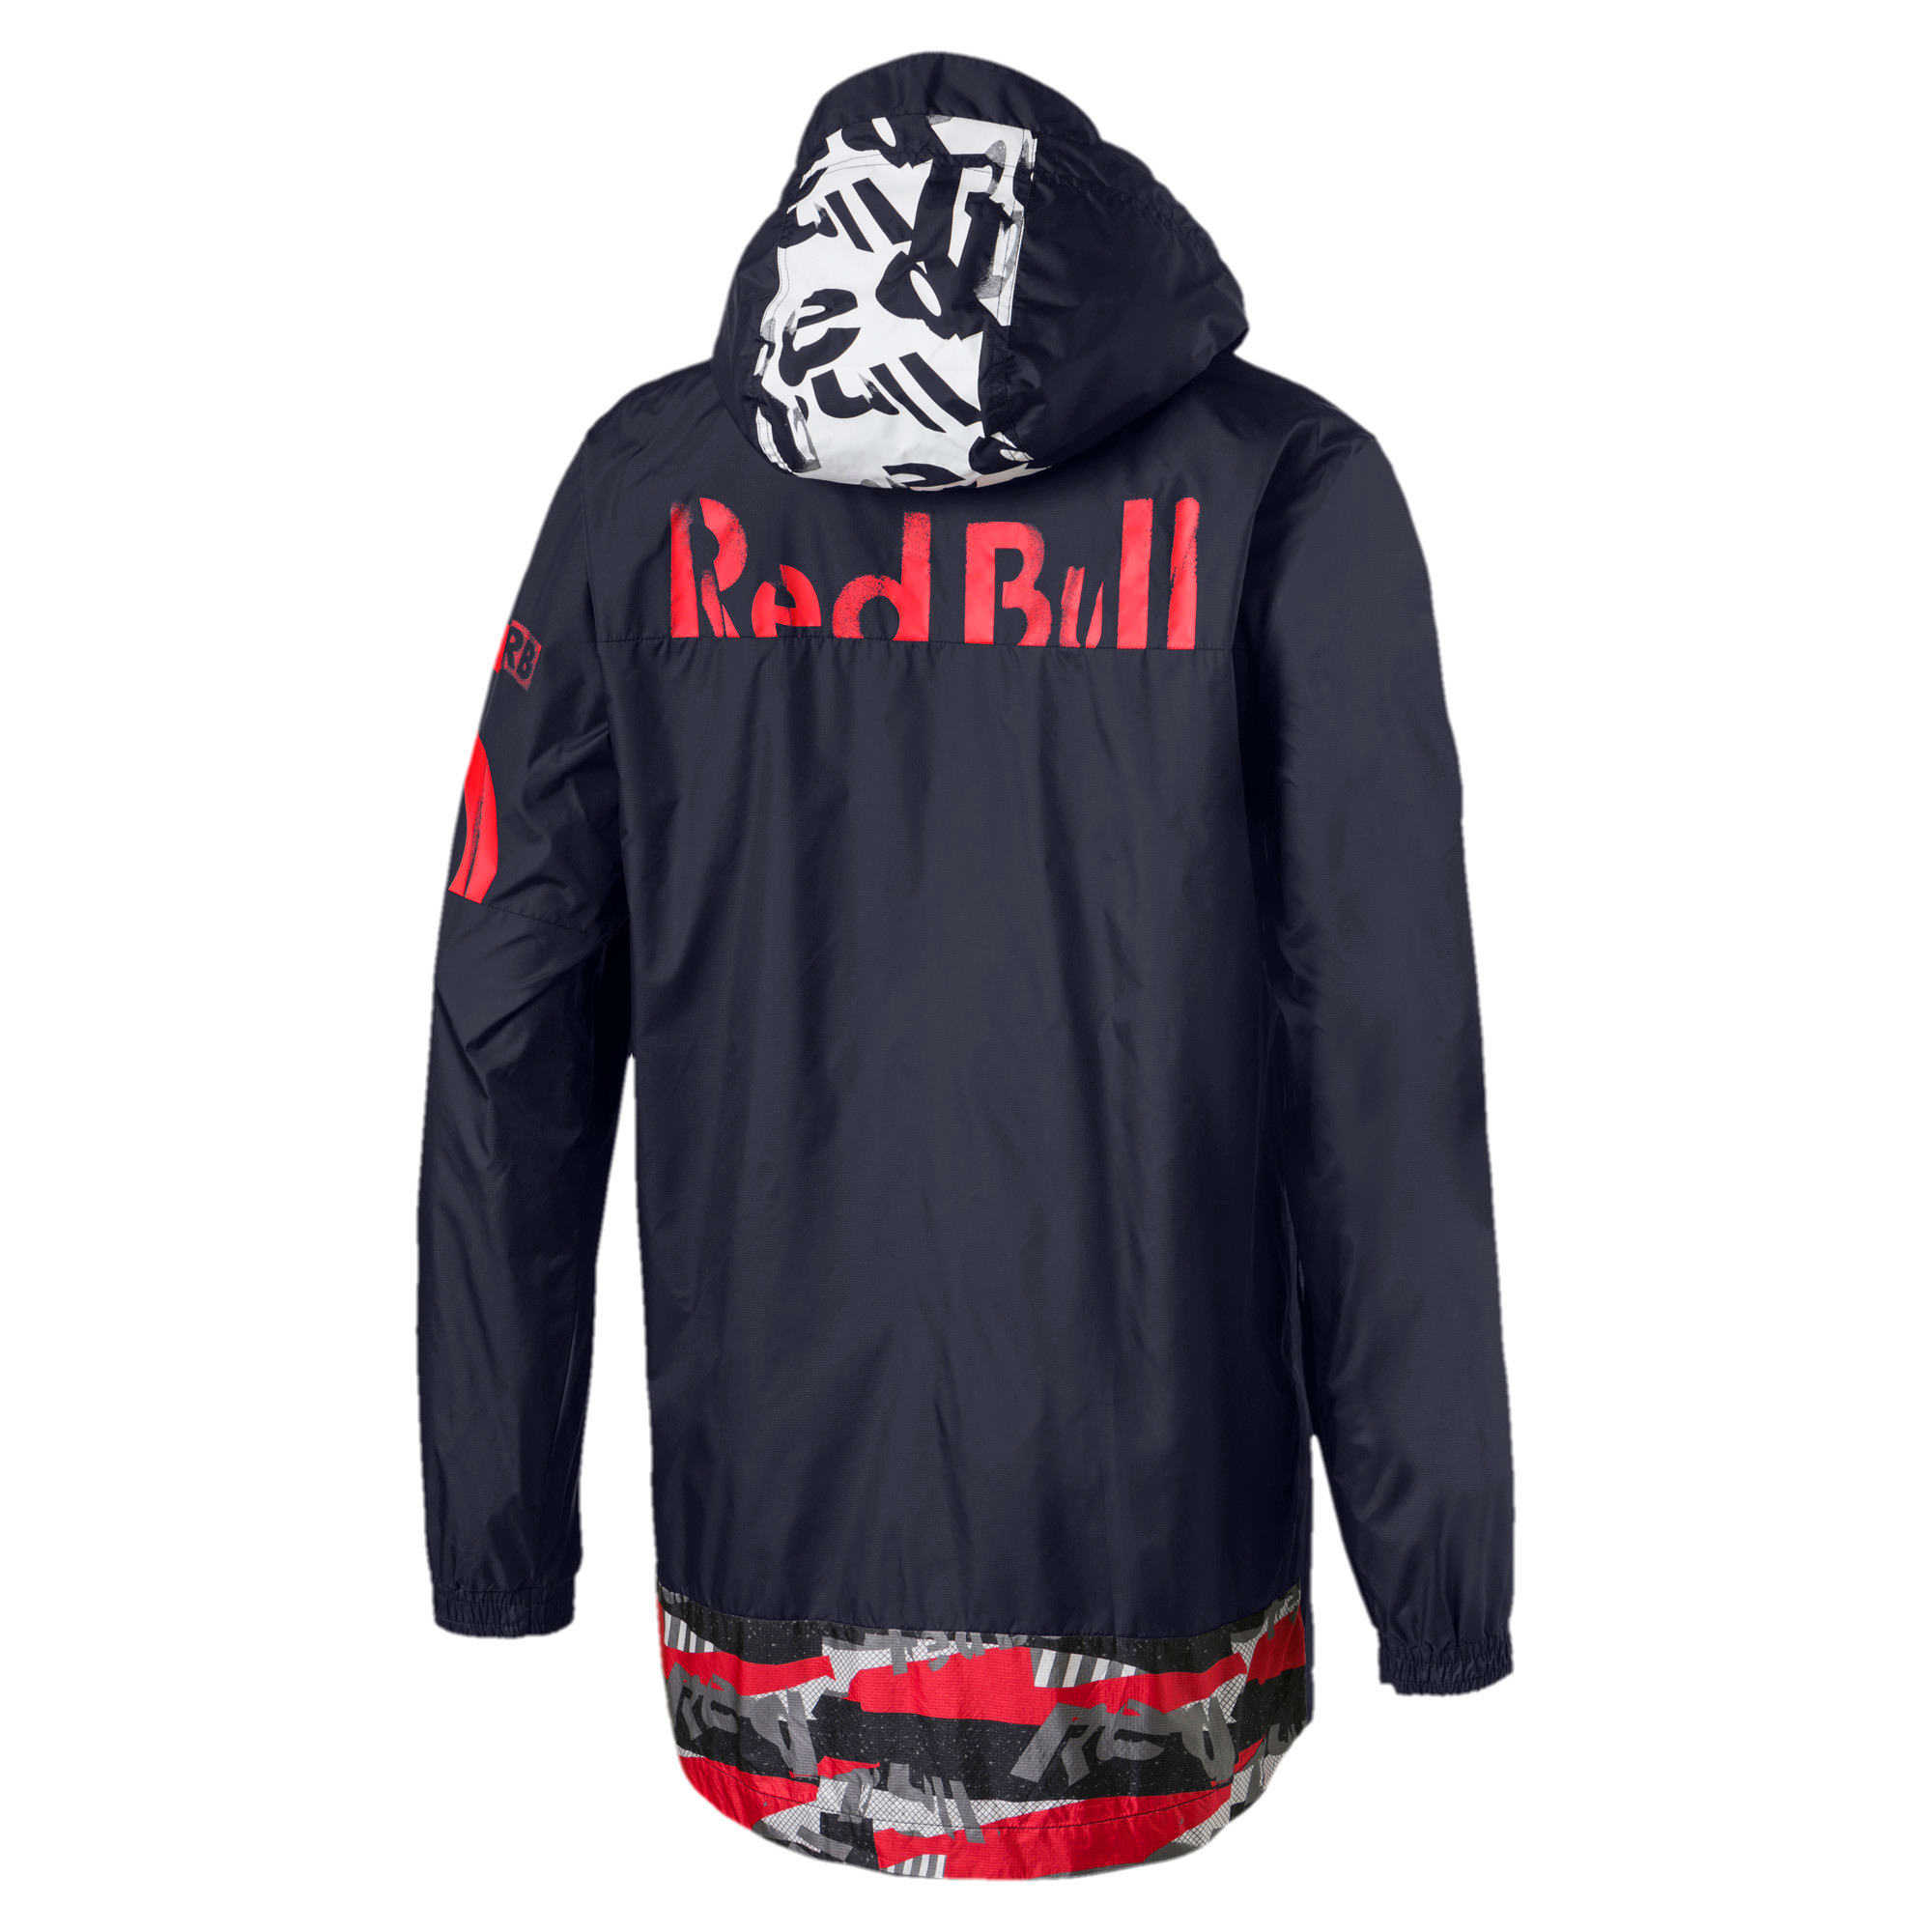 Thumbnail 2 of Red Bull Racing RCT Men's Jacket, NIGHT SKY, medium